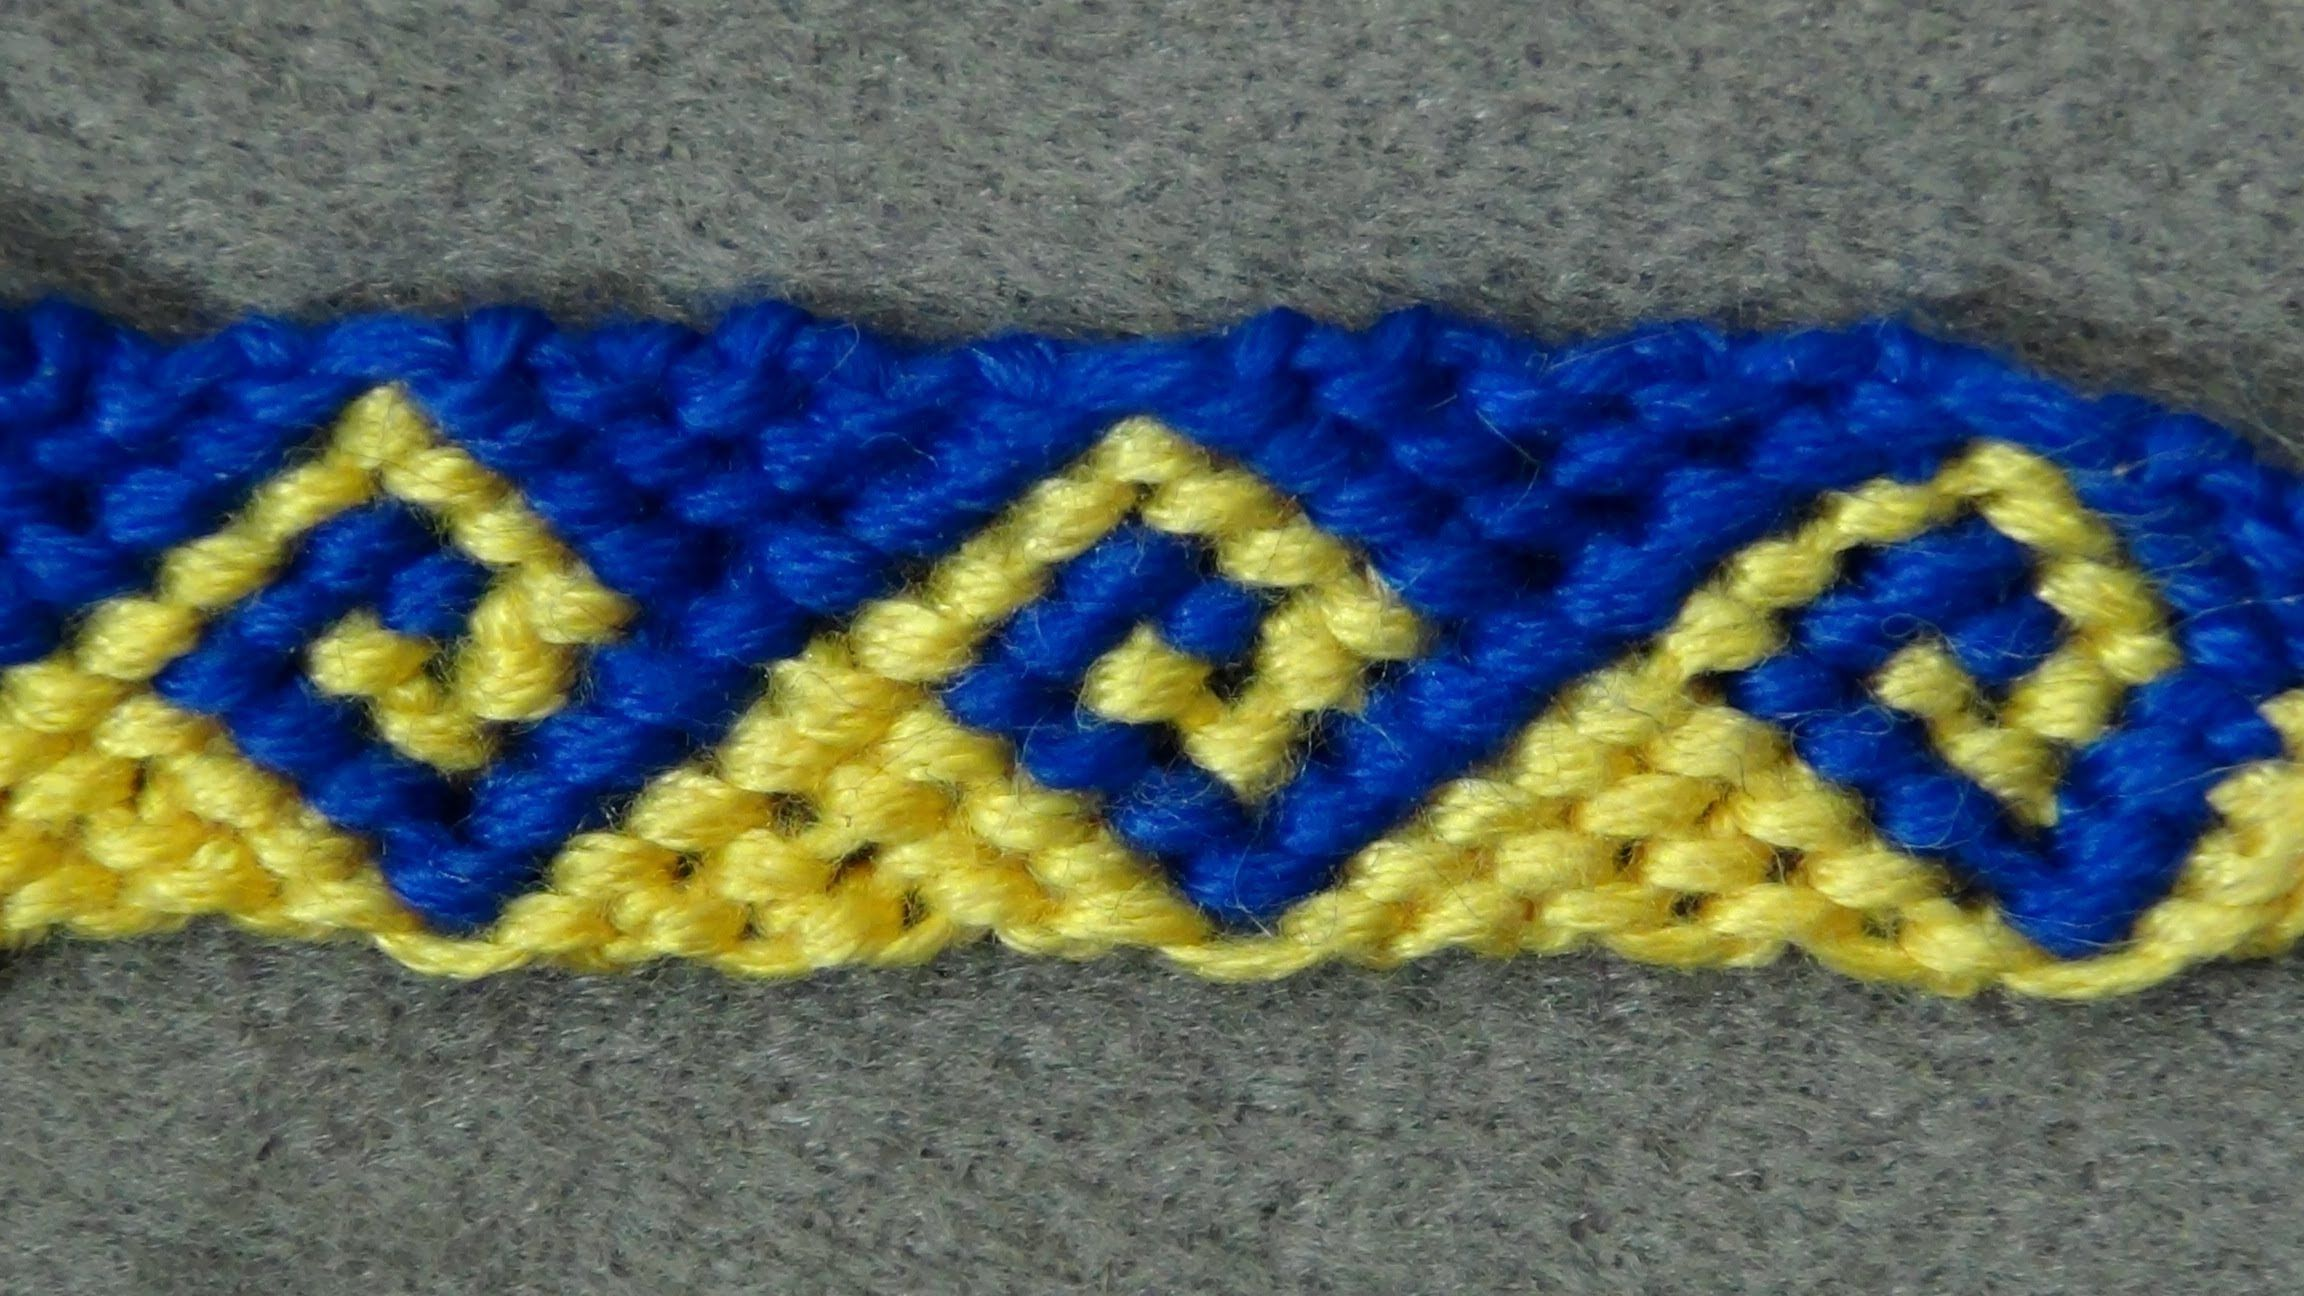 dd14e3a3b994a ▻ Friendship Bracelet Tutorial 34 - Intermediate - The Greek Wave ...